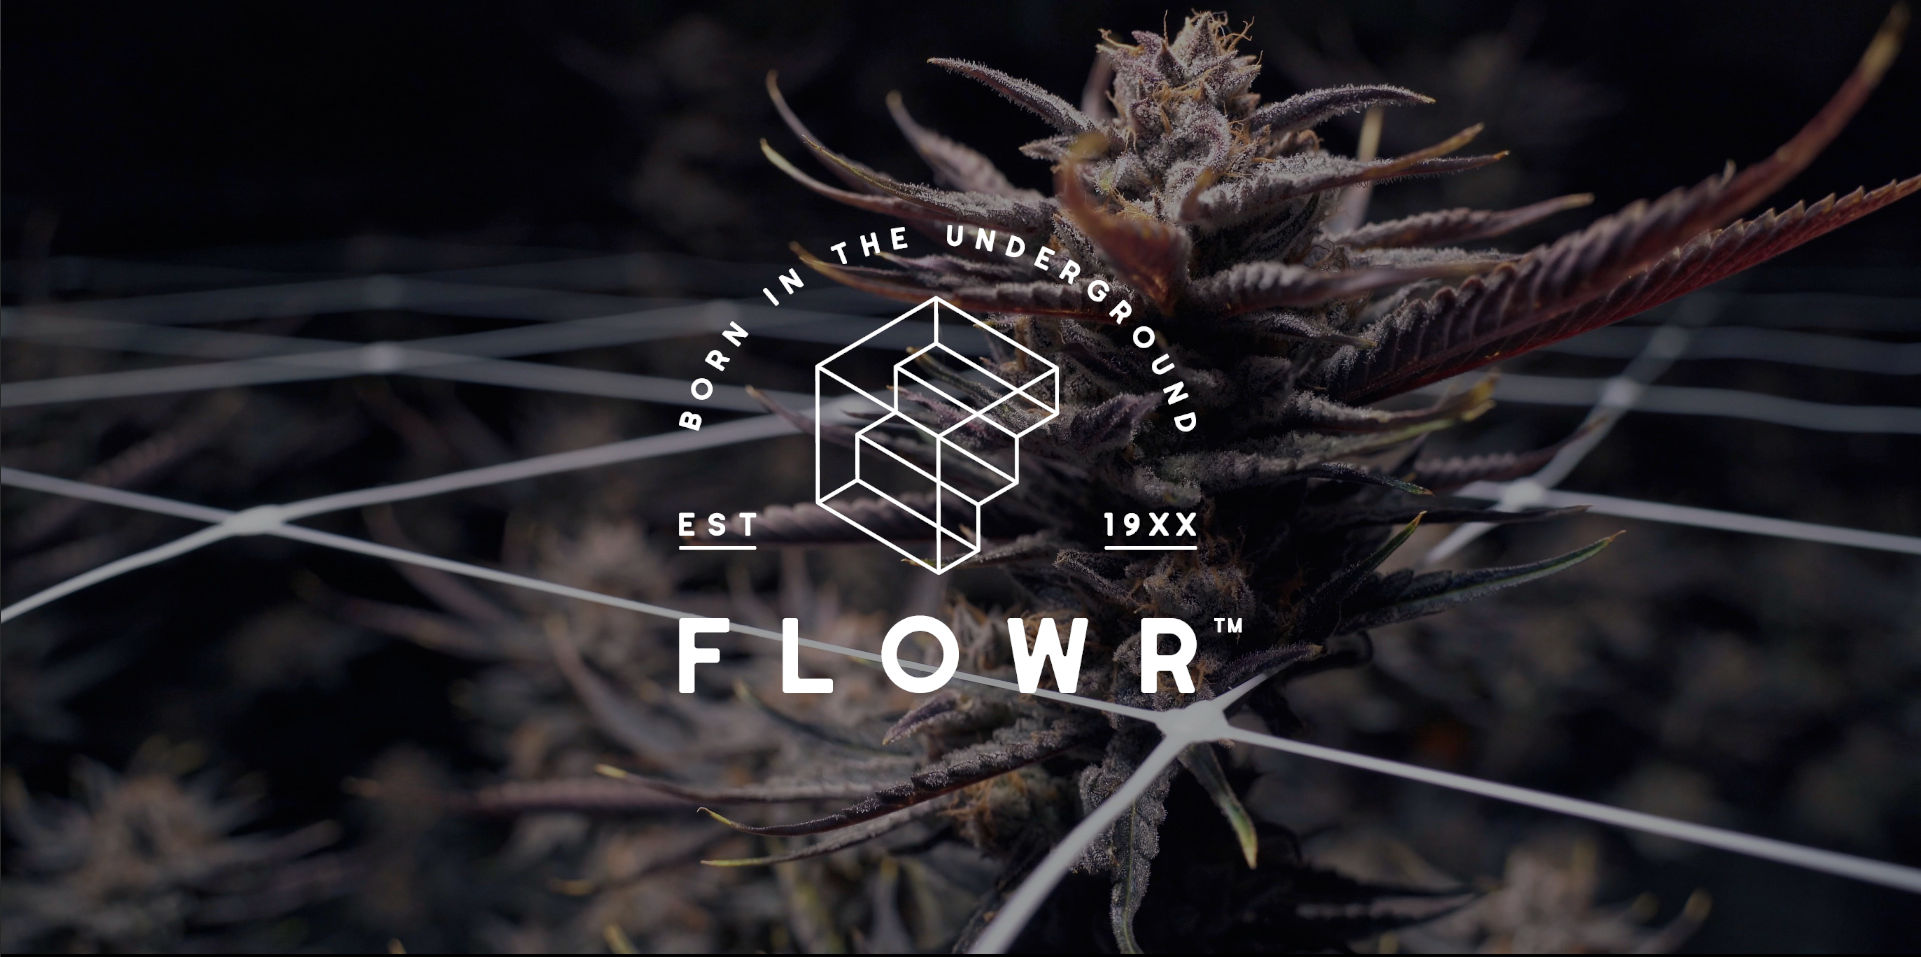 flowr cannabis stacked white logo with dark purple cannabis plants in background